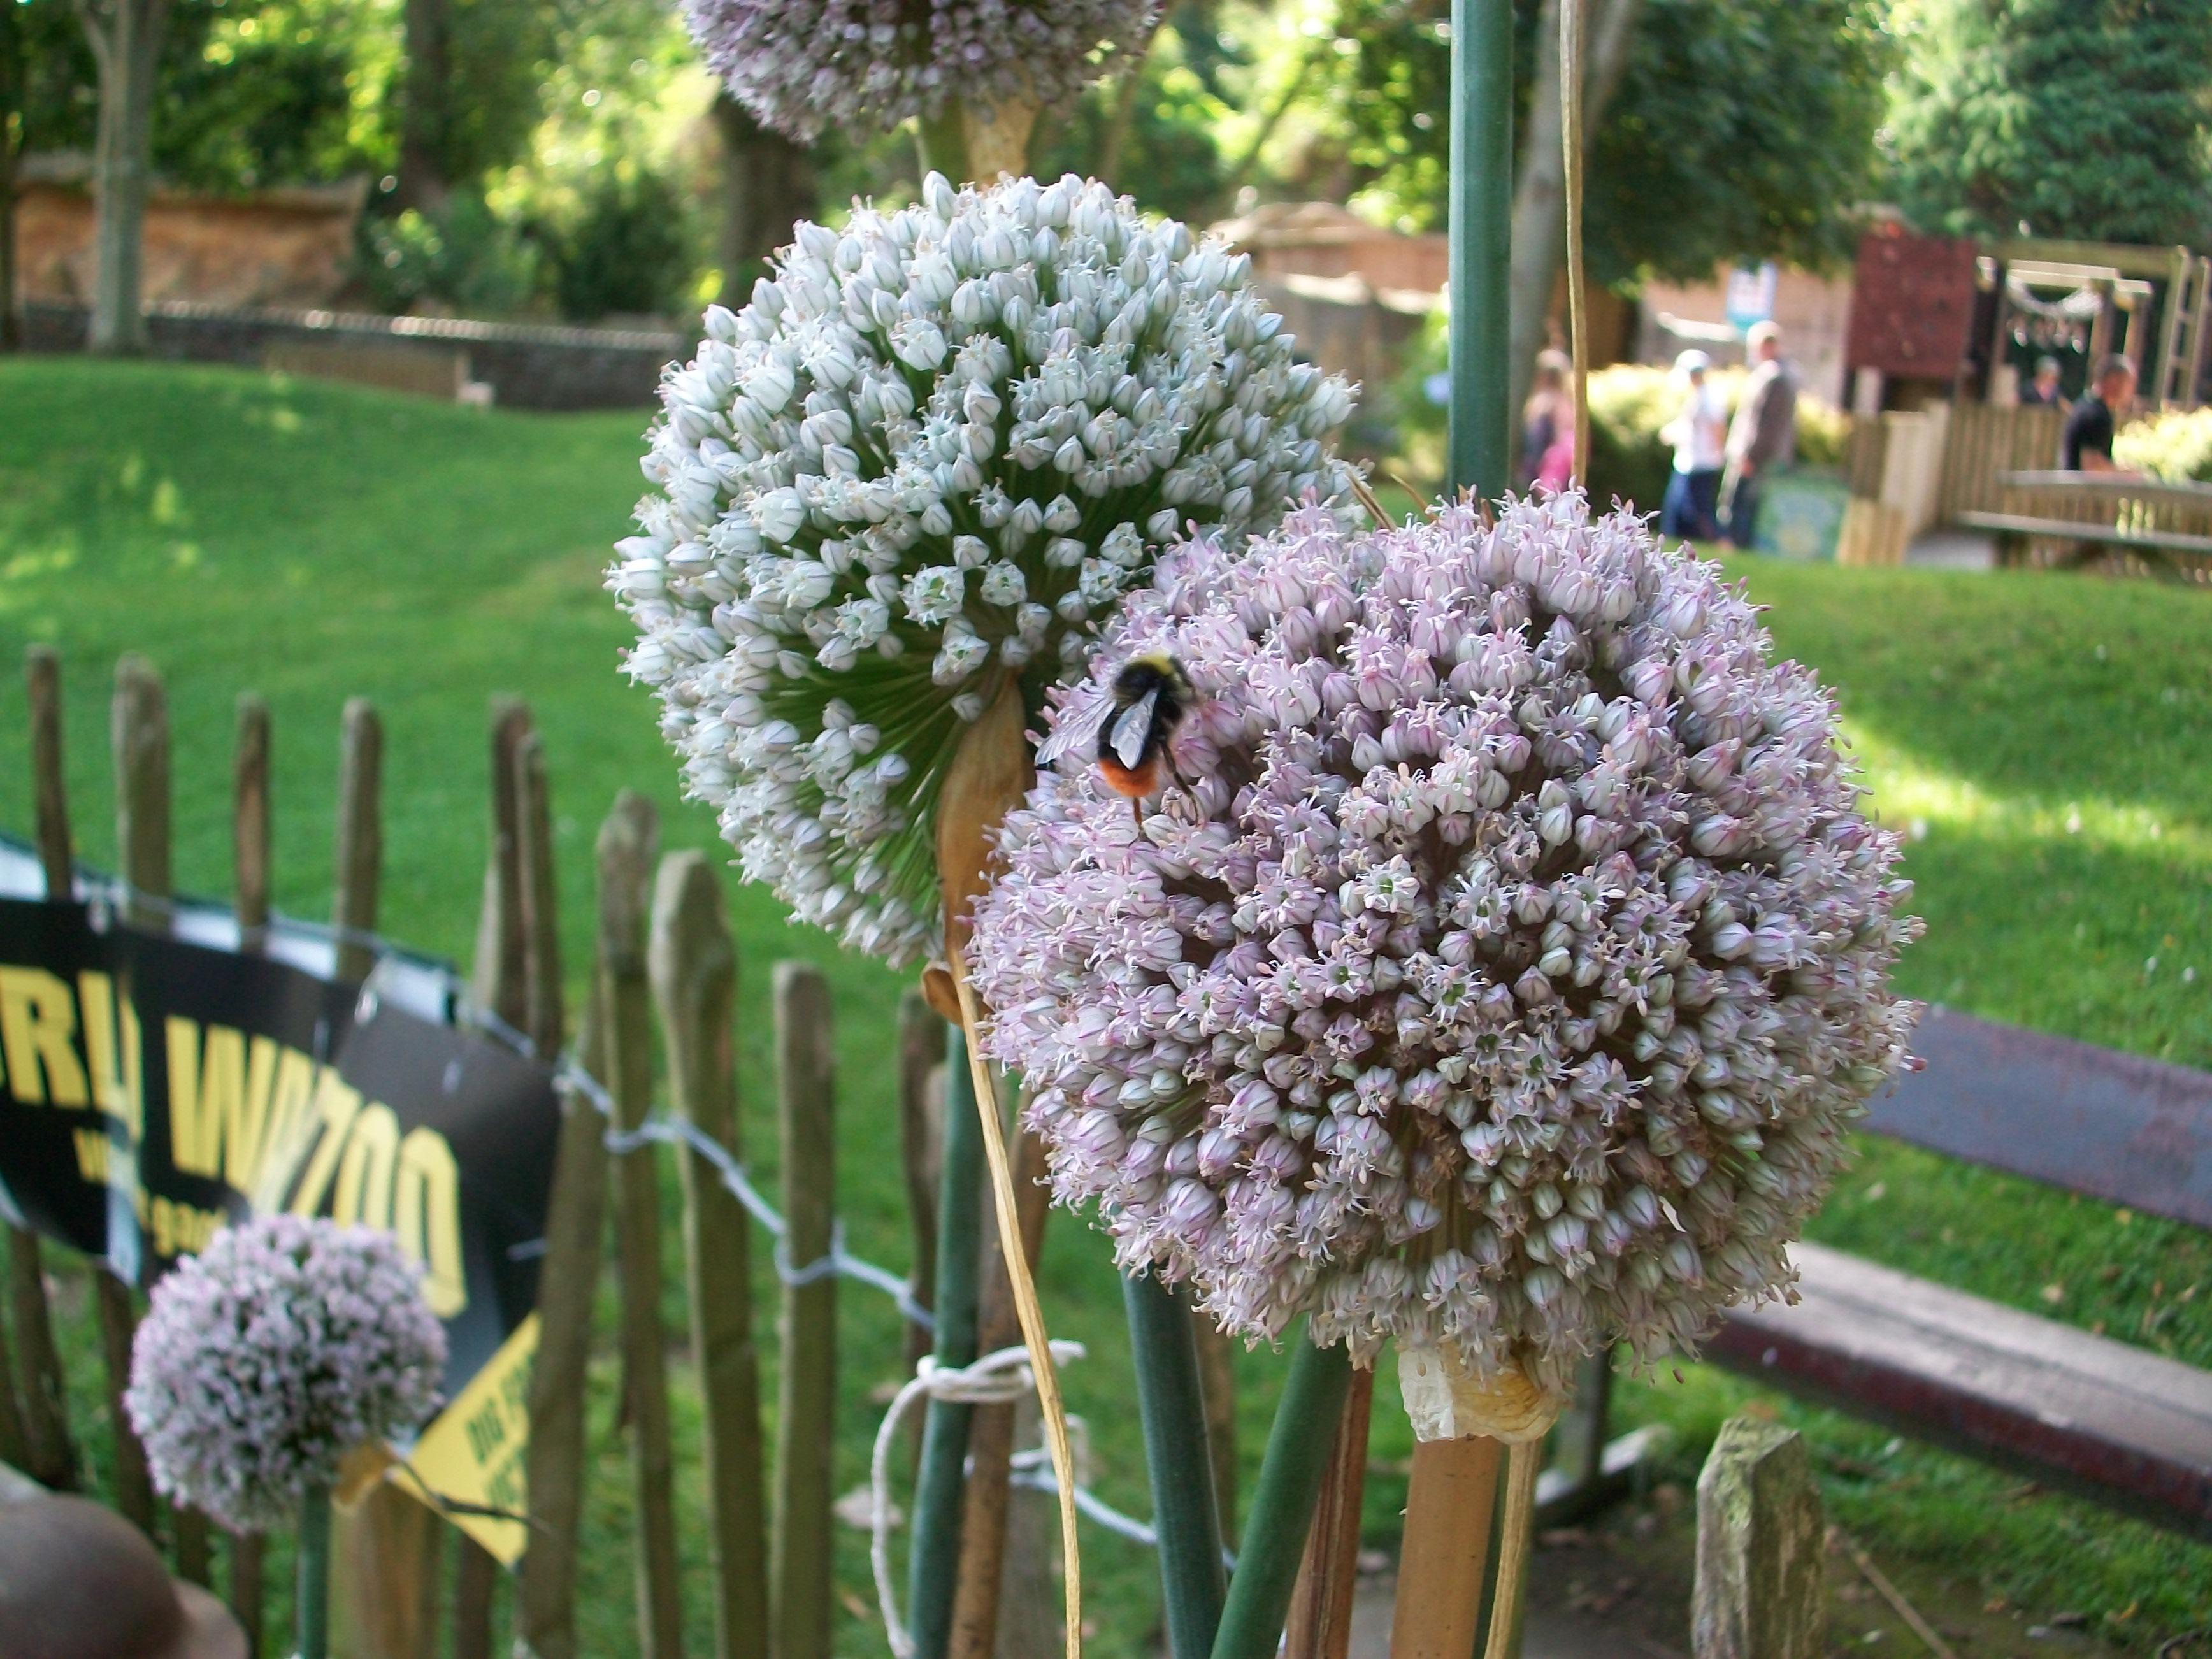 Leeks seeds and bees World War Zoo gardens 020